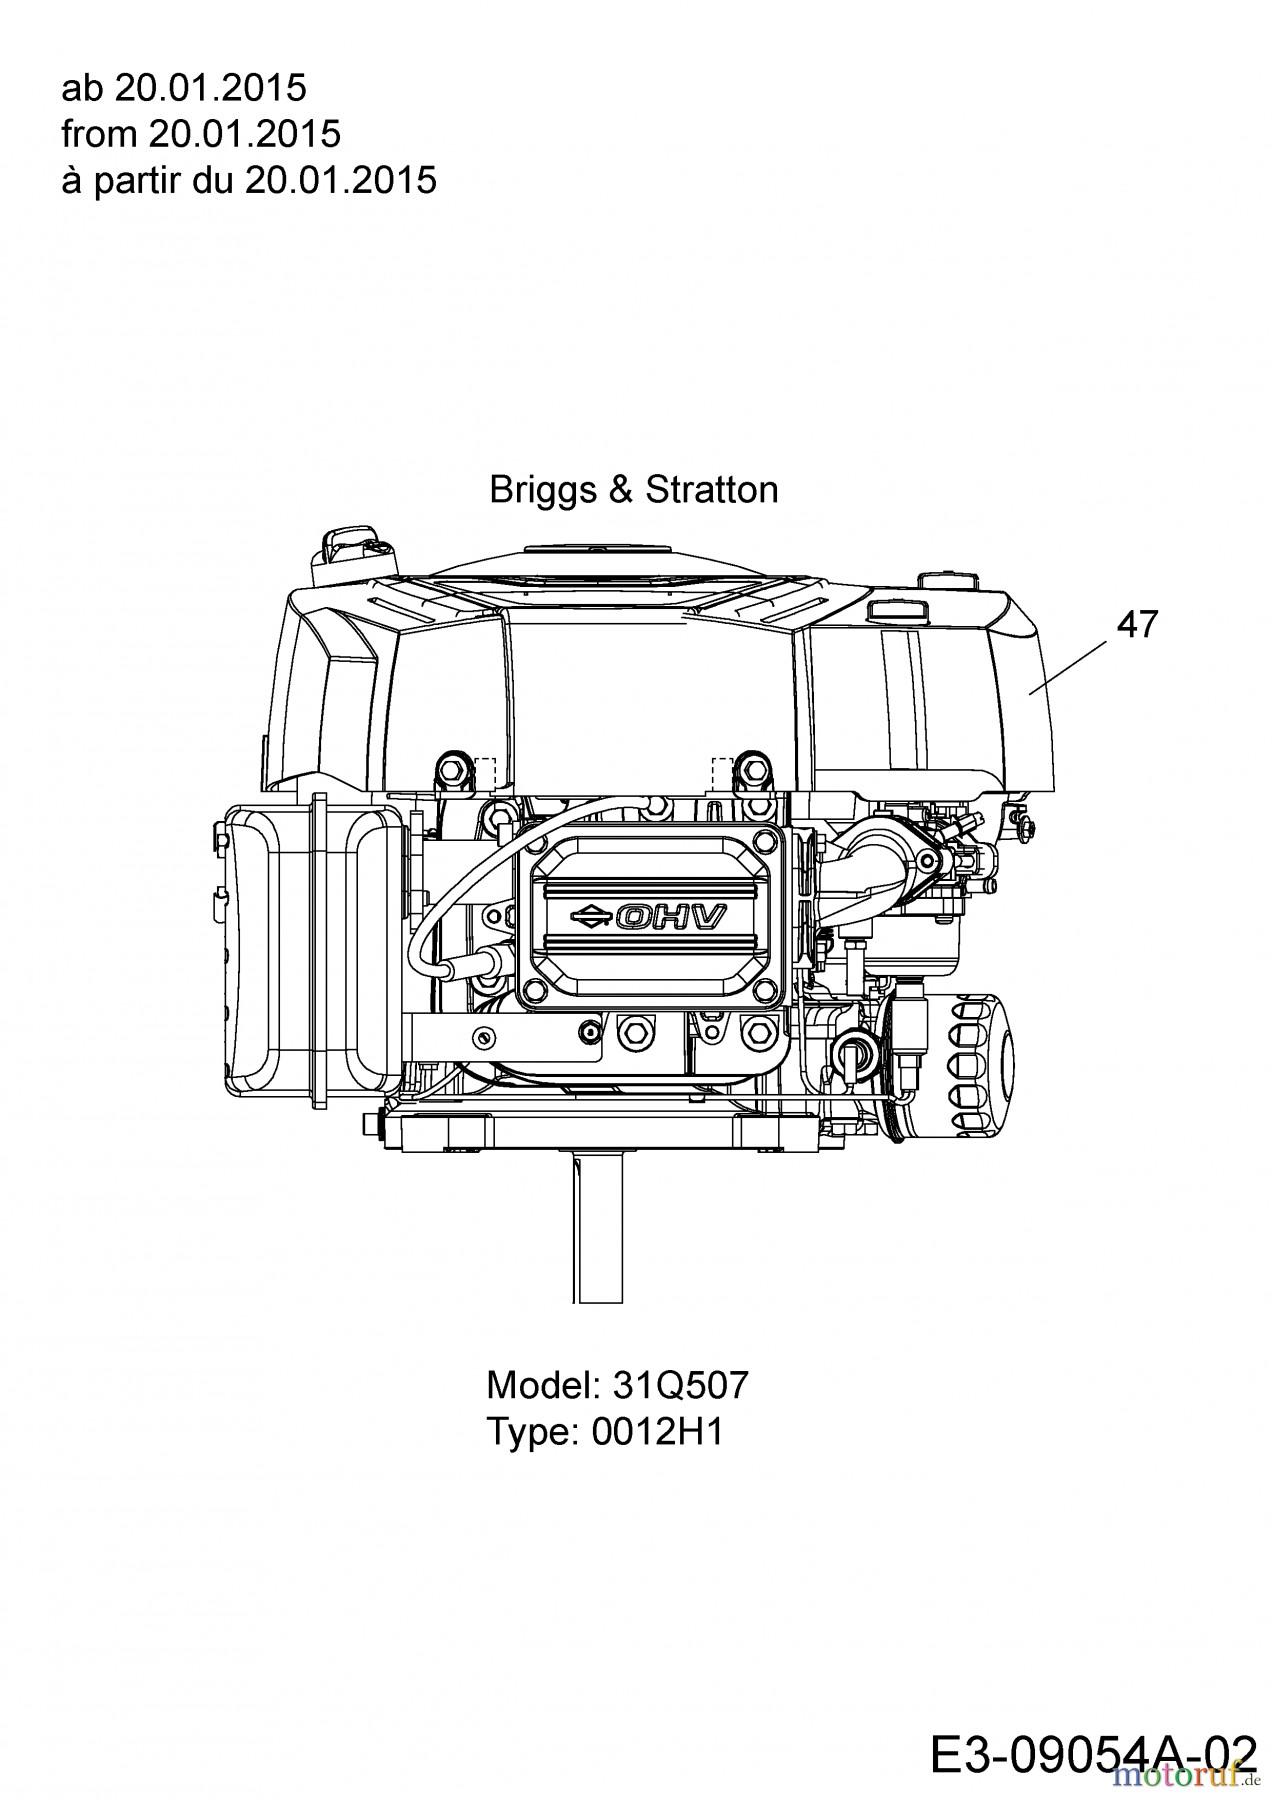 Briggs and Stratton 500 Series Engine Diagram Engine B&s